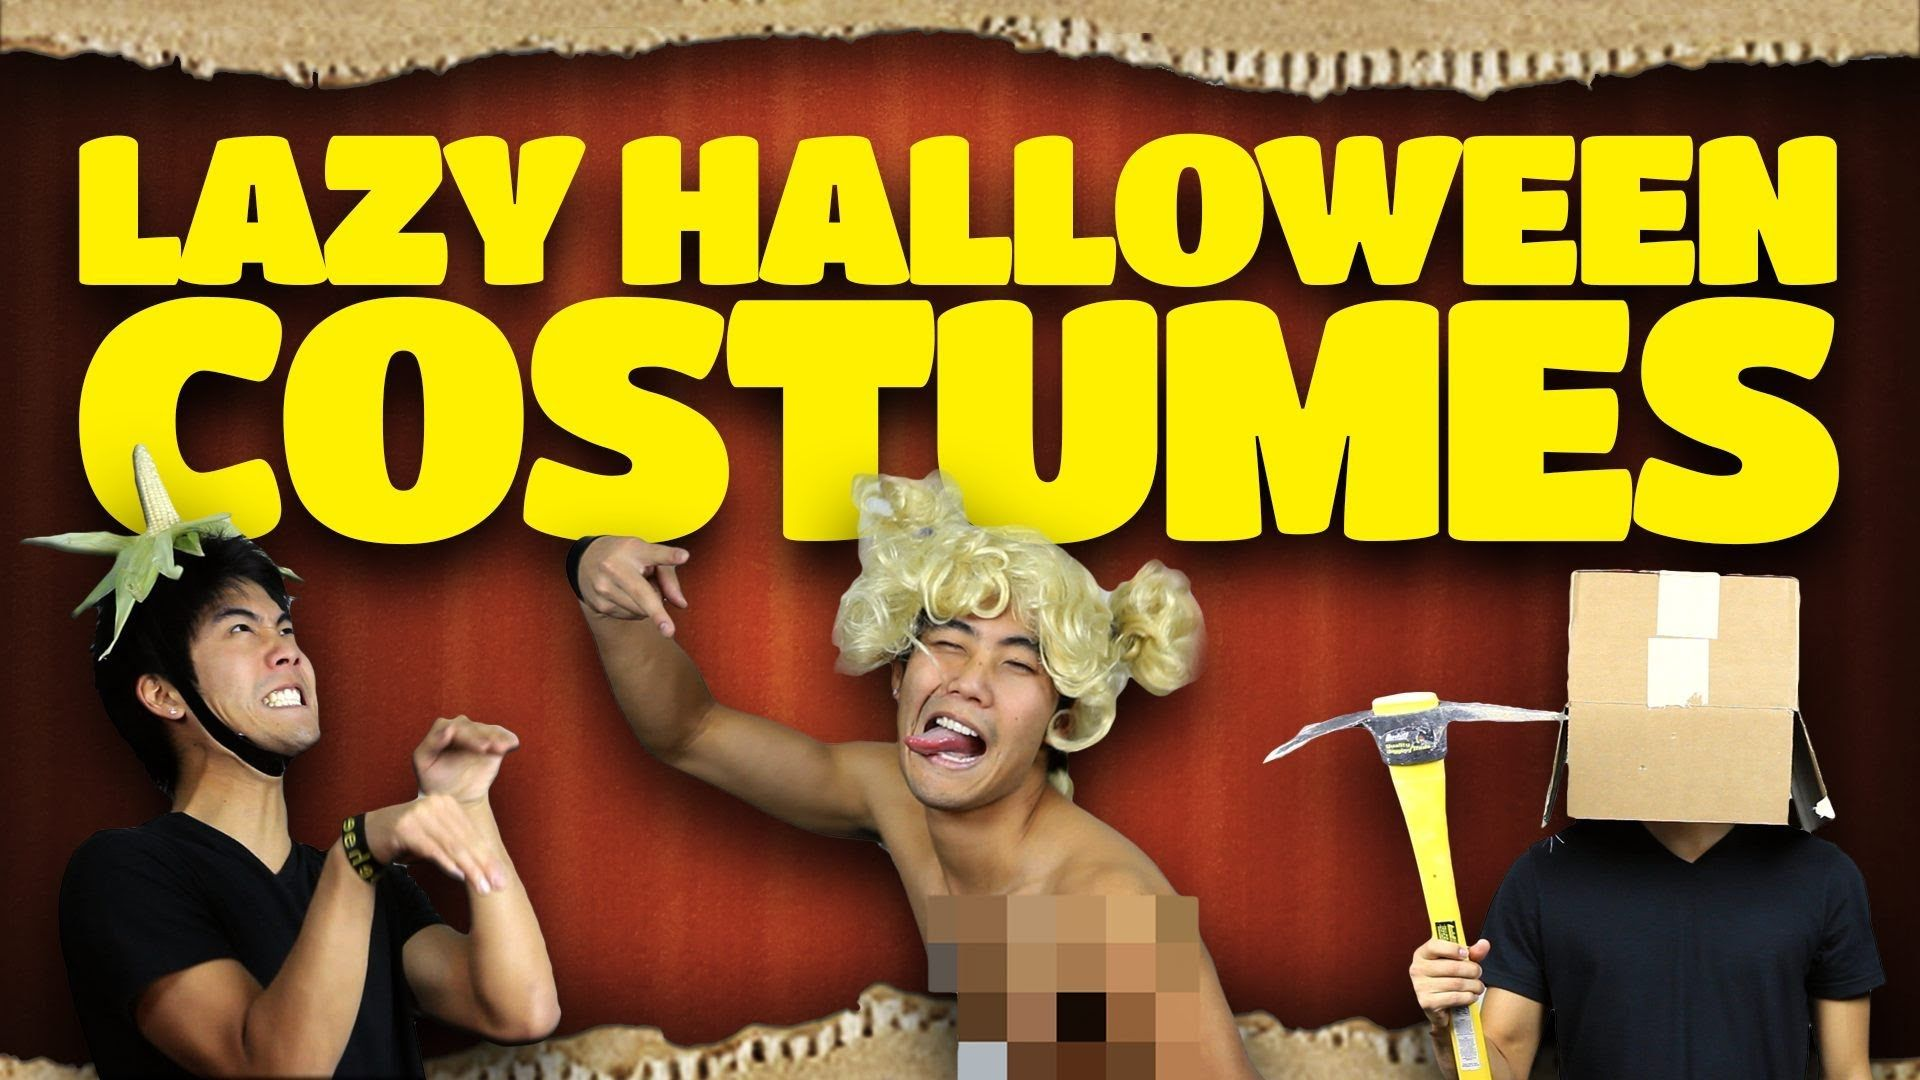 Lazy halloween costume ideas hilarious random crap pinterest lazy halloween costume ideas solutioingenieria Choice Image